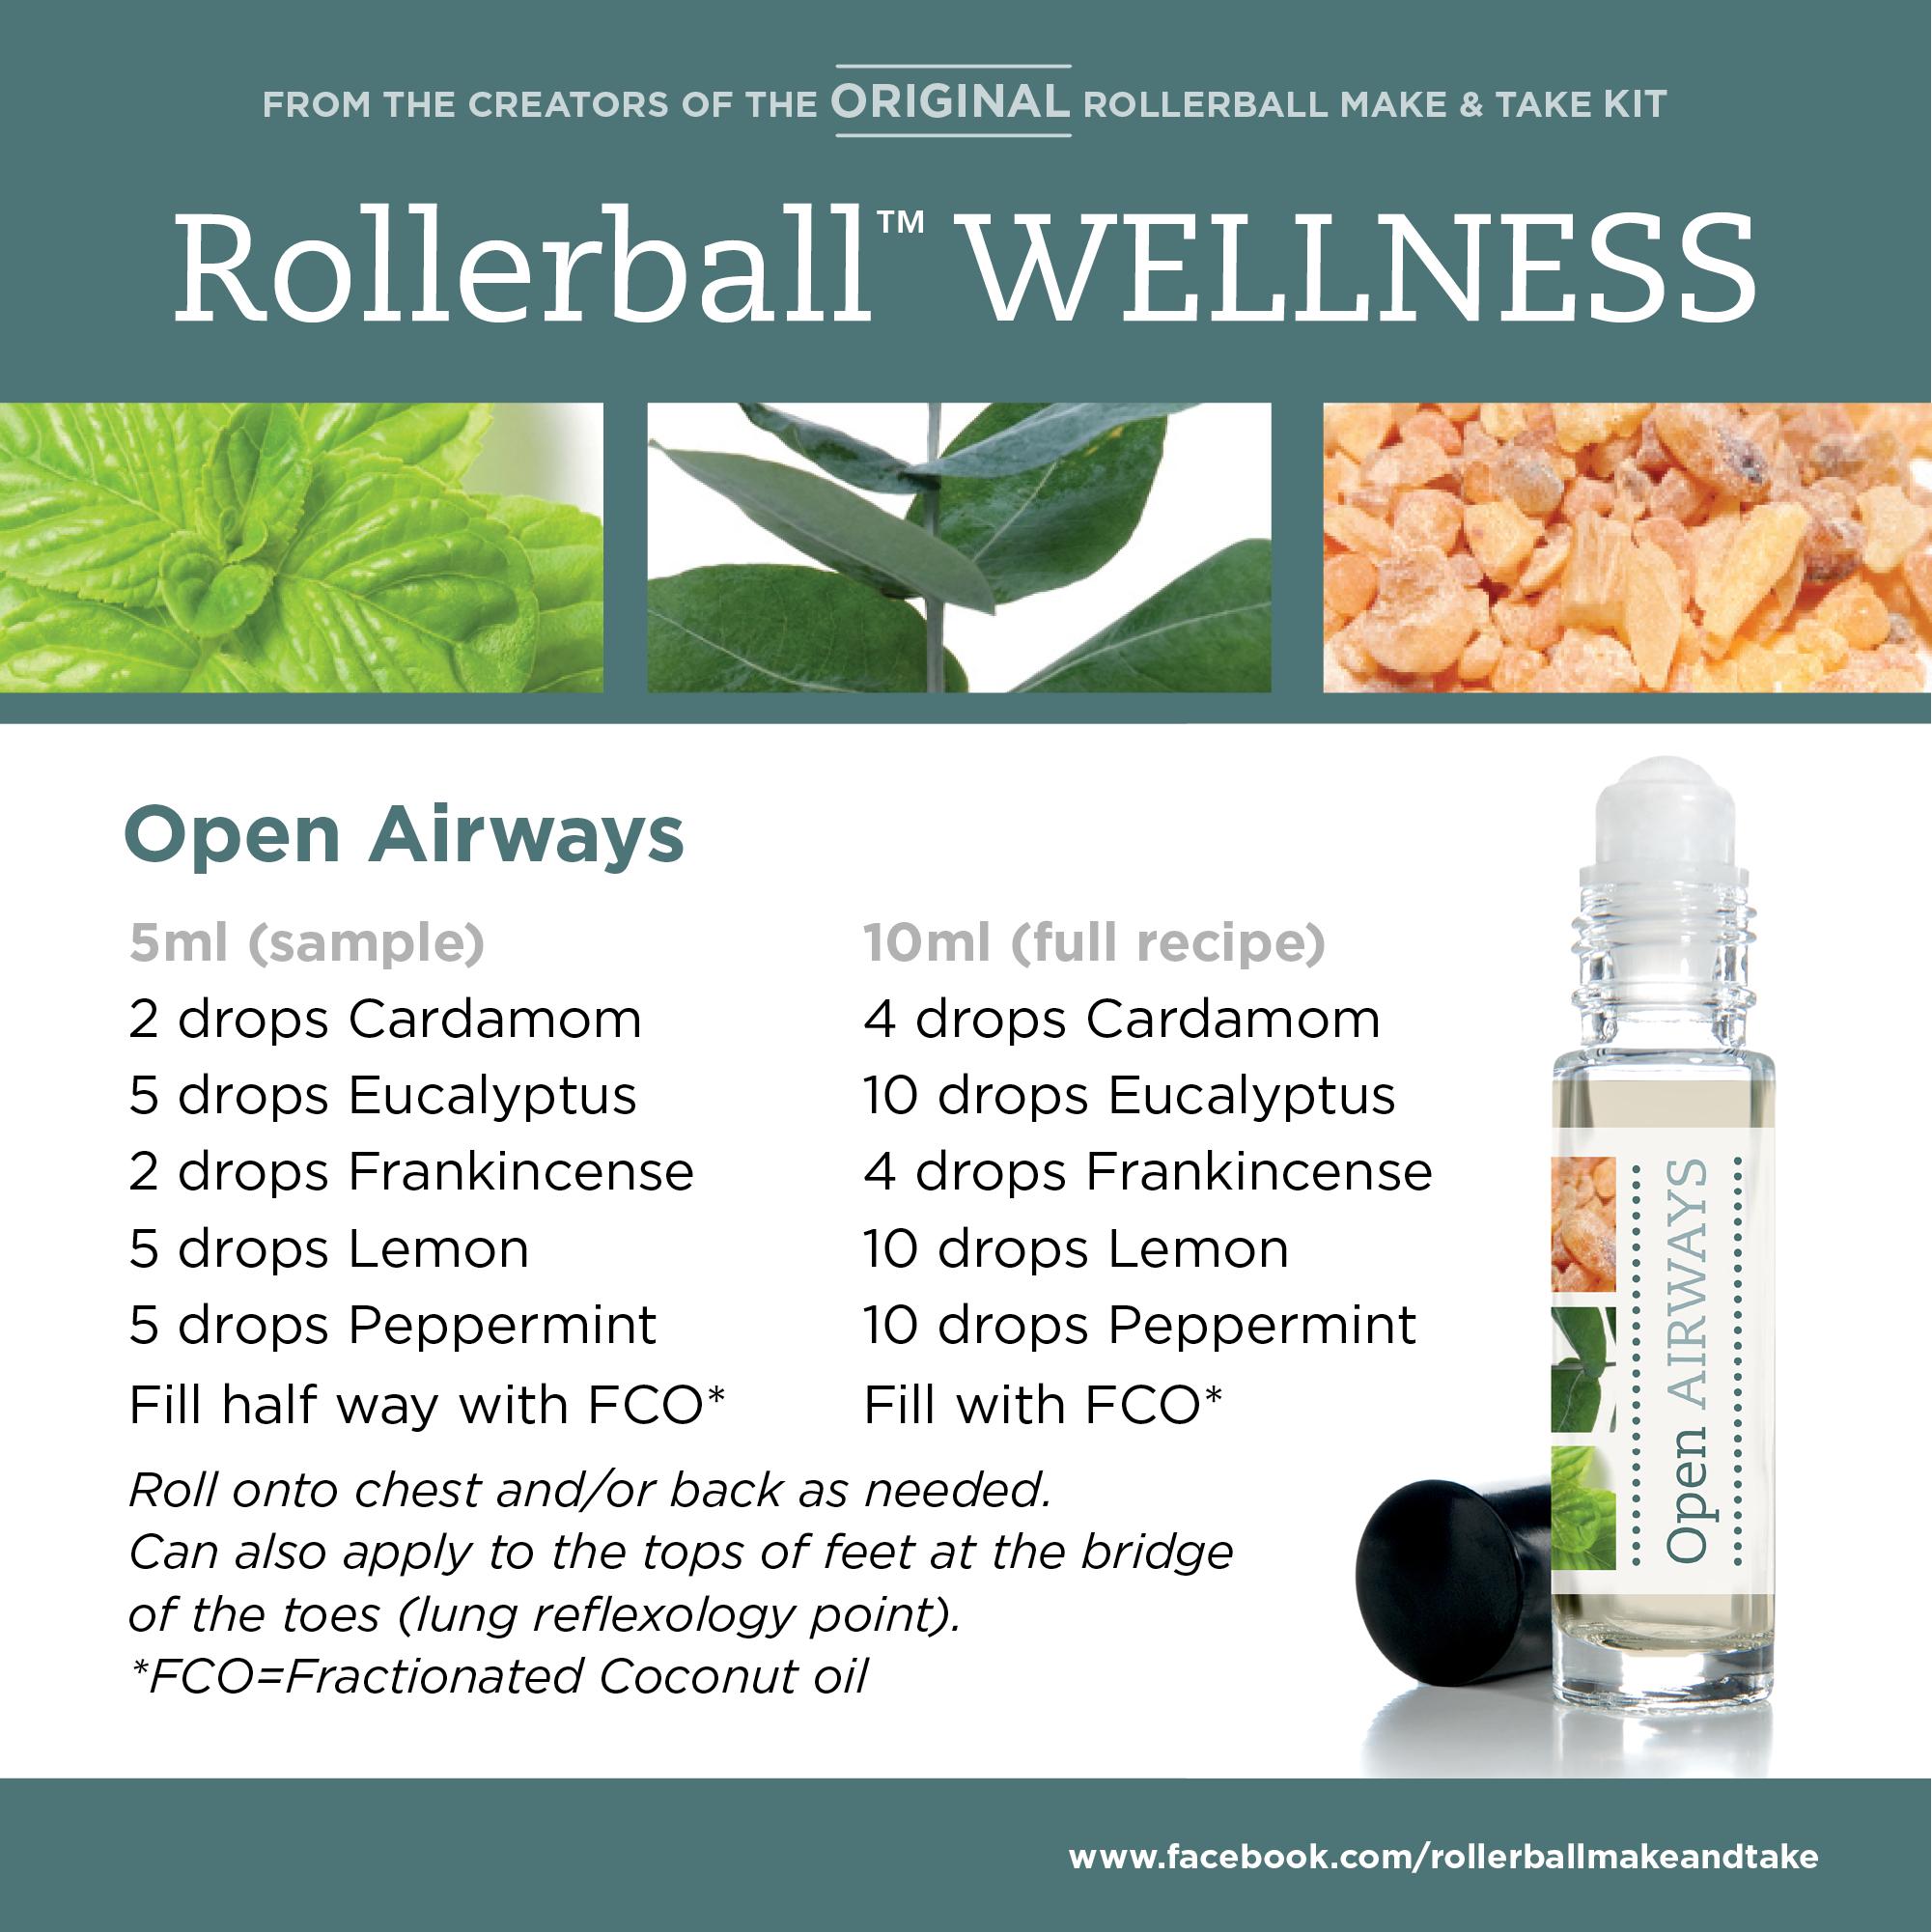 Open Airways Rollerball WELLNESS Make & Take